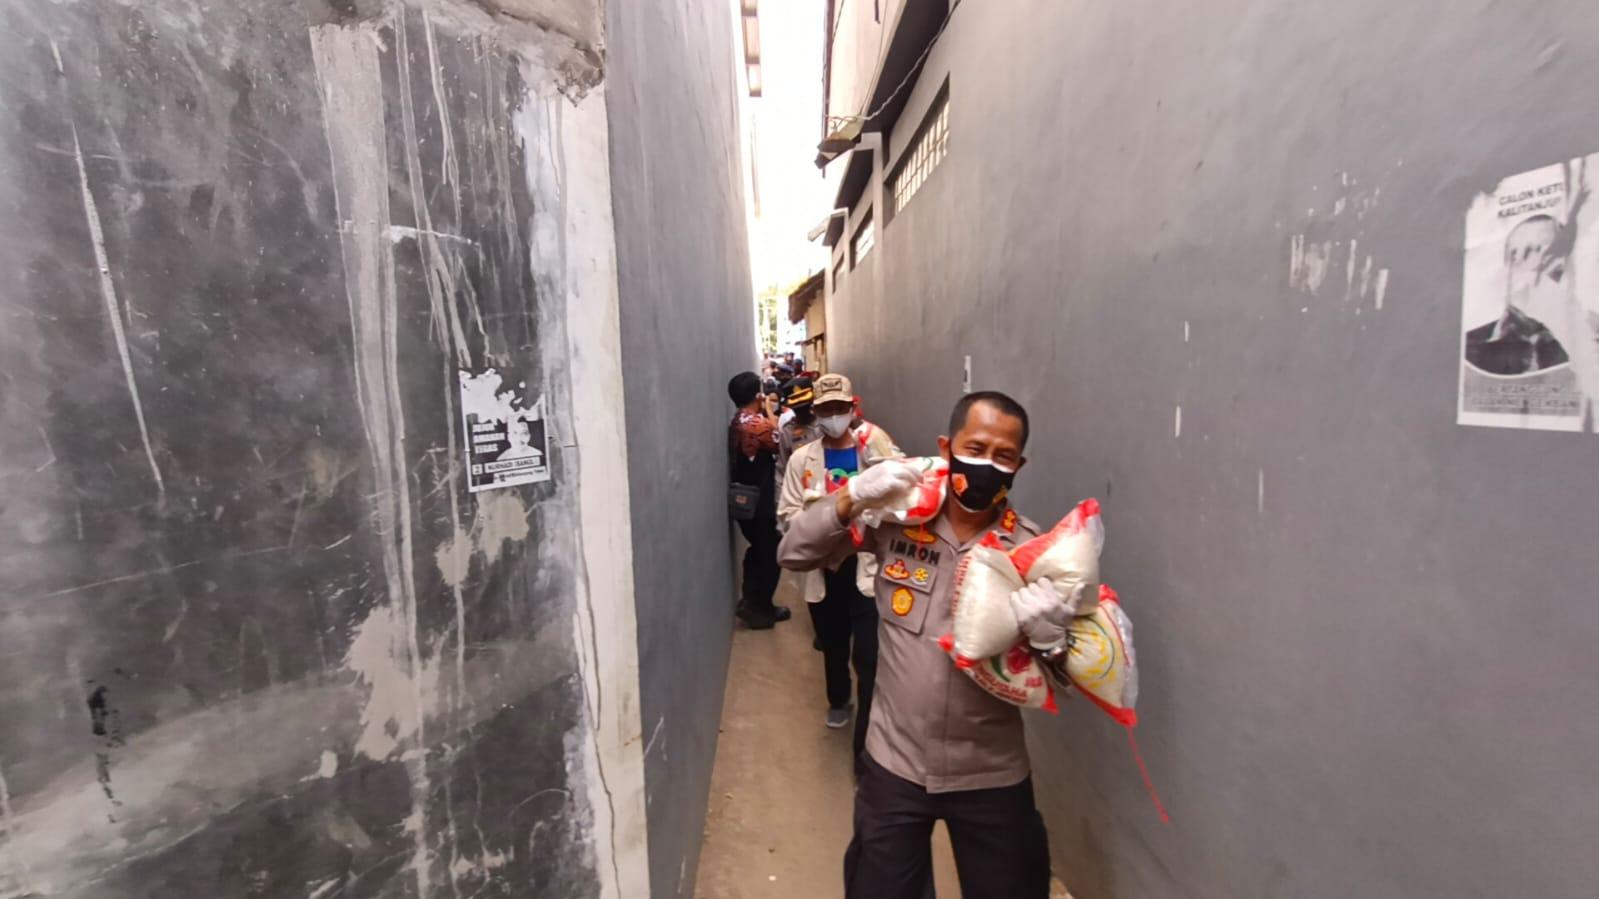 Kapolres Cirebon Kota Hadiri Vaksinasi Covid-19 Dosis ke-1 serta Bakti Sosial Sinergitas TNI-Polri dan BEM PTM